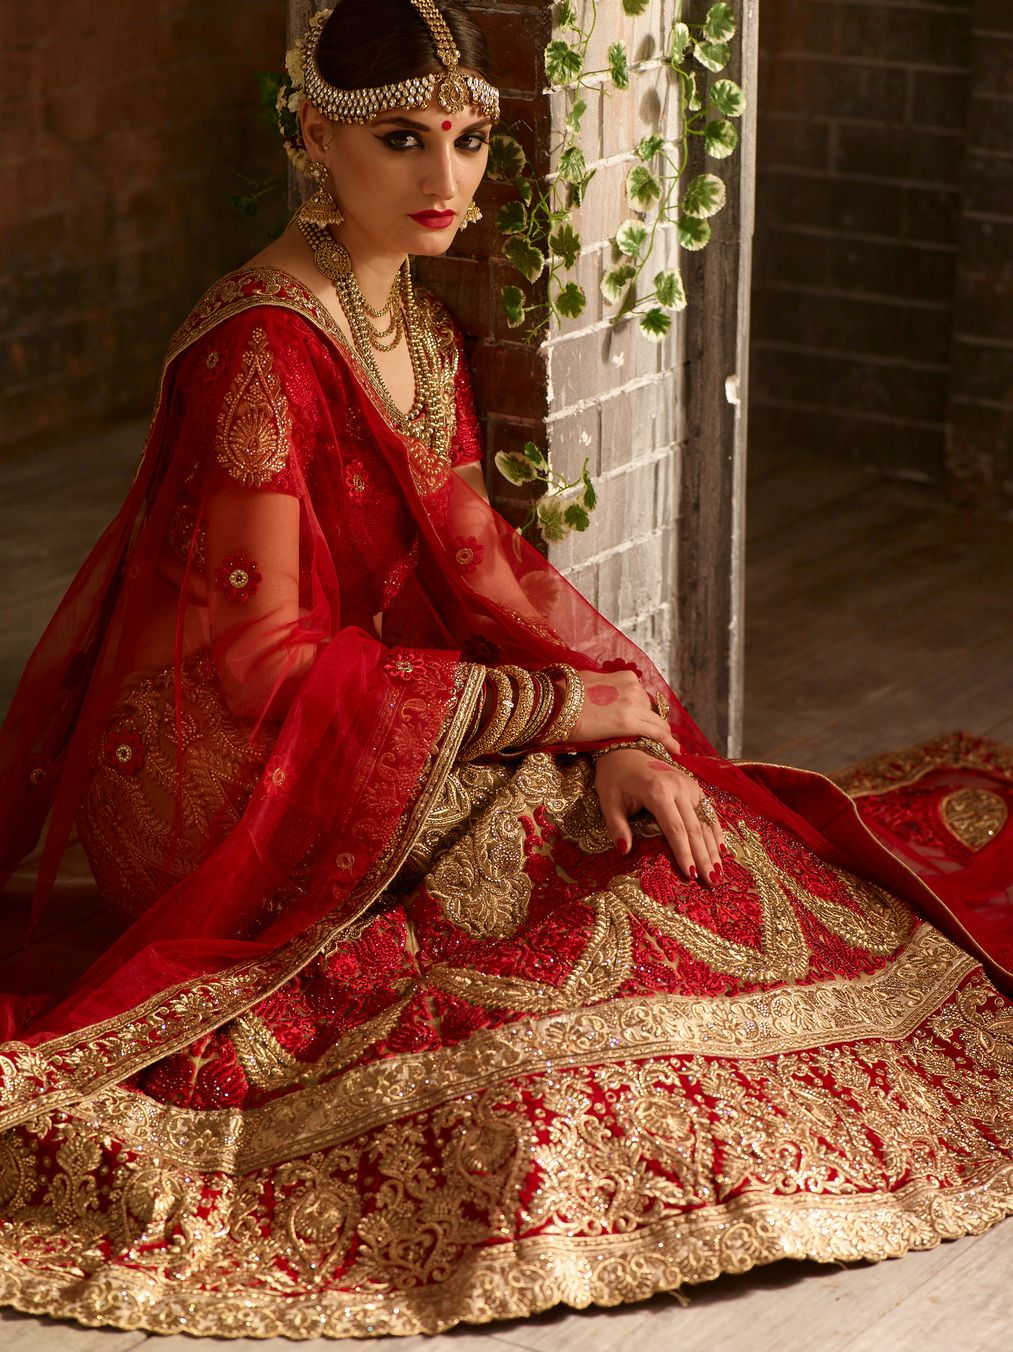 Hindu wedding dress  Pin by ROSA DIVYA on Indian wedding dresses  Pinterest  Indian